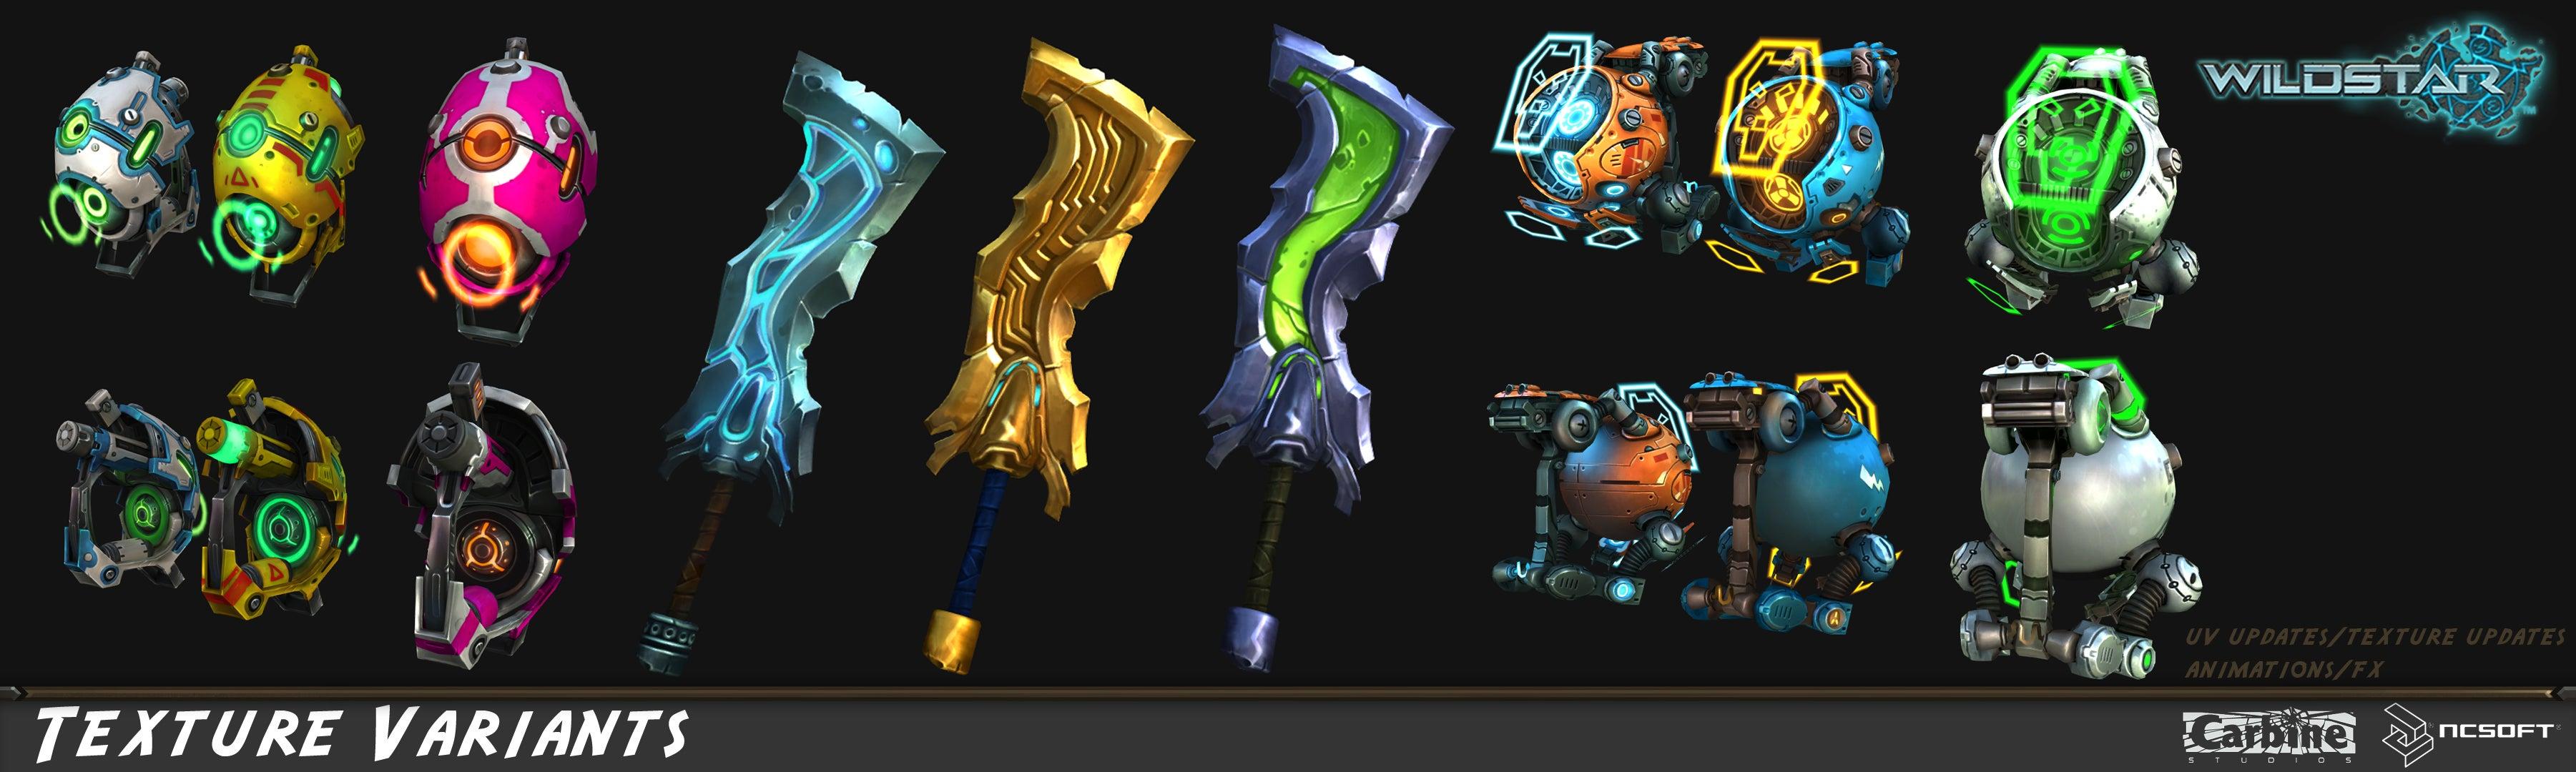 Space Guns, Come Get Your Space Guns